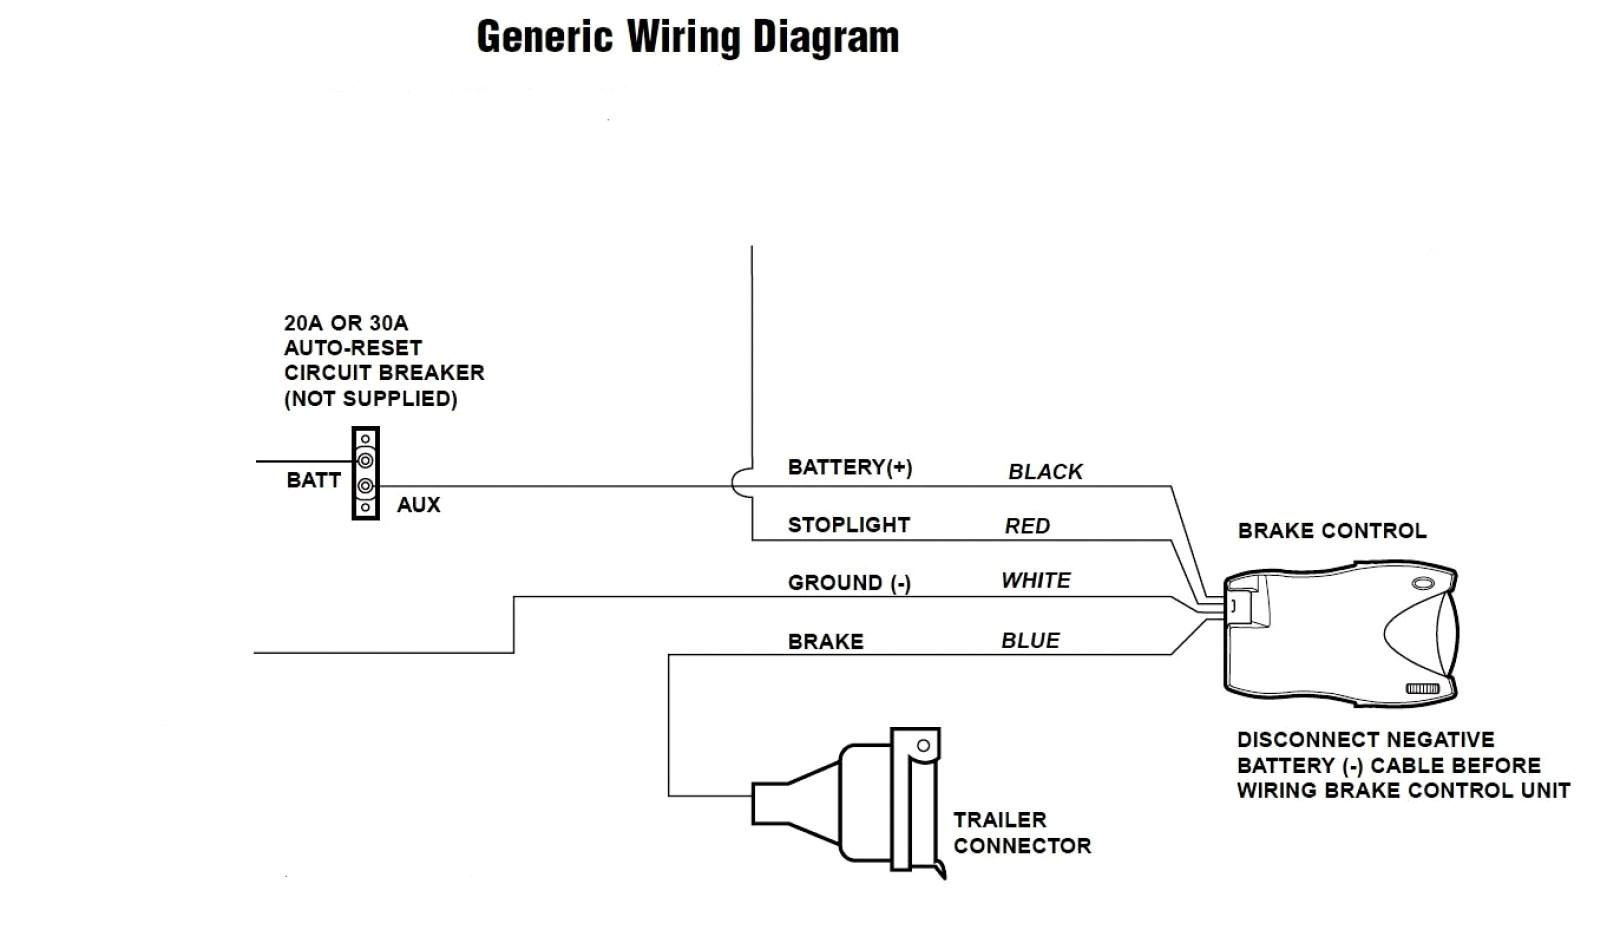 prodigy wiring diagram data schematic diagram tekonsha prodigy wiring diagram fender prodigy wiring diagram blog wiring